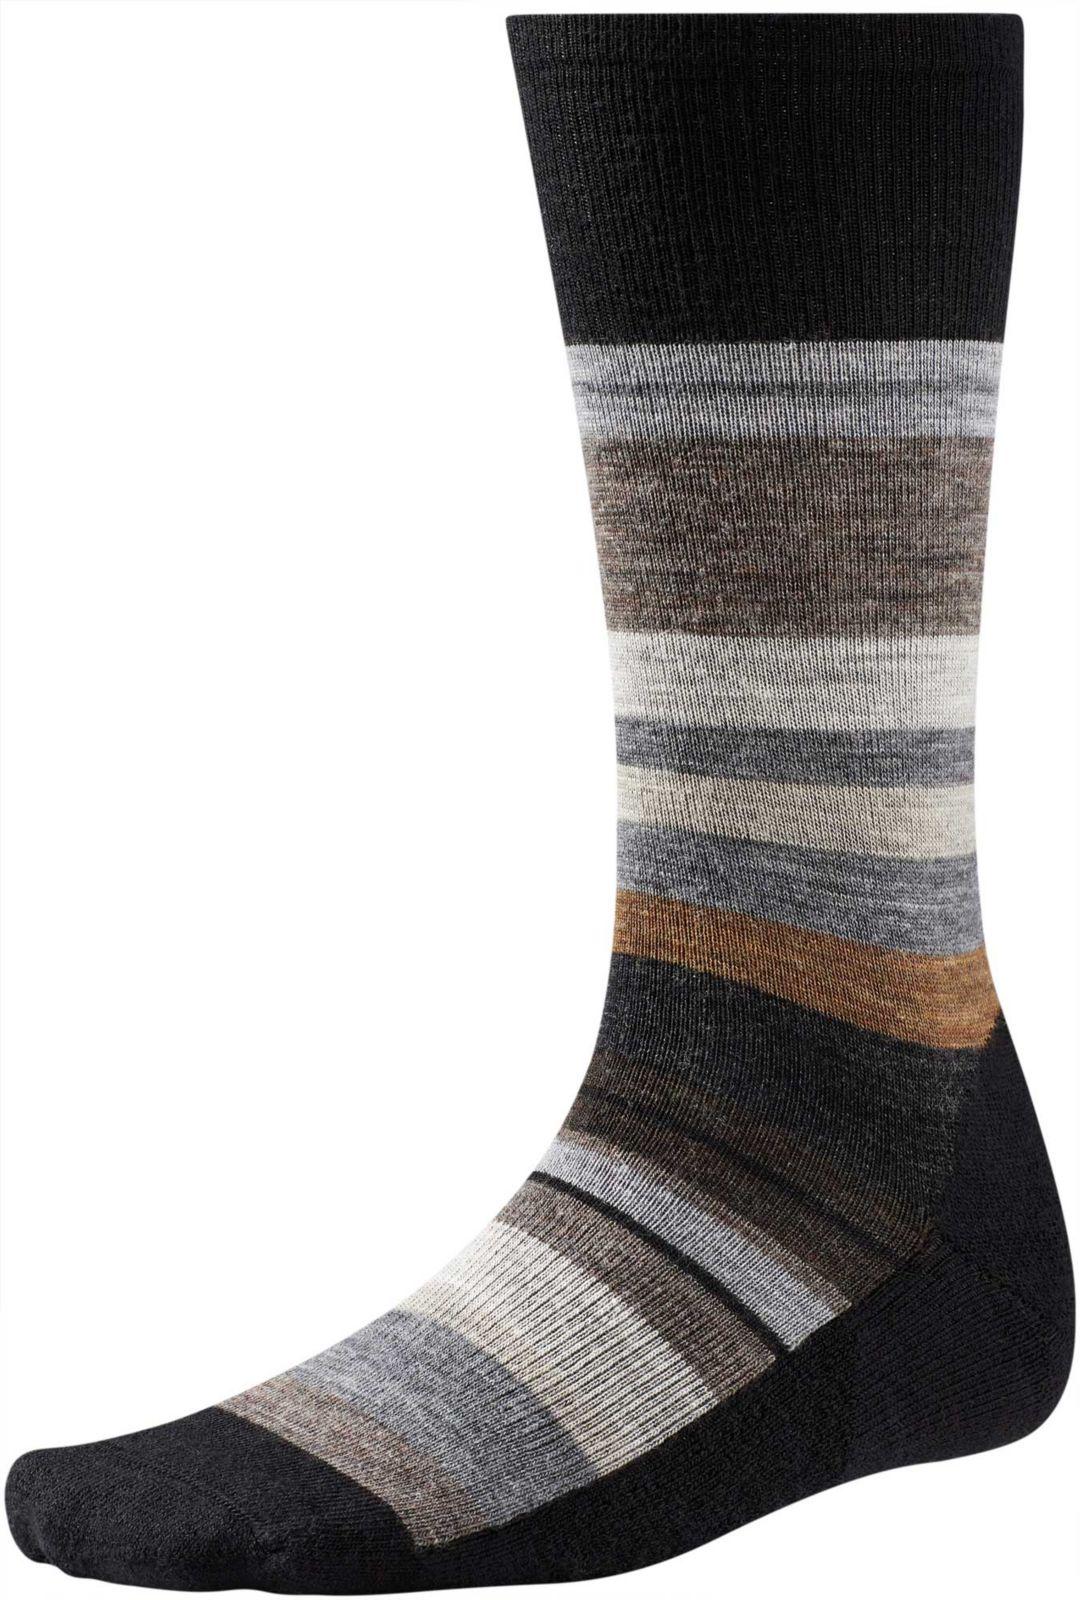 dc457c8766c61 SmartWool Saturnsphere Crew Socks | DICK'S Sporting Goods